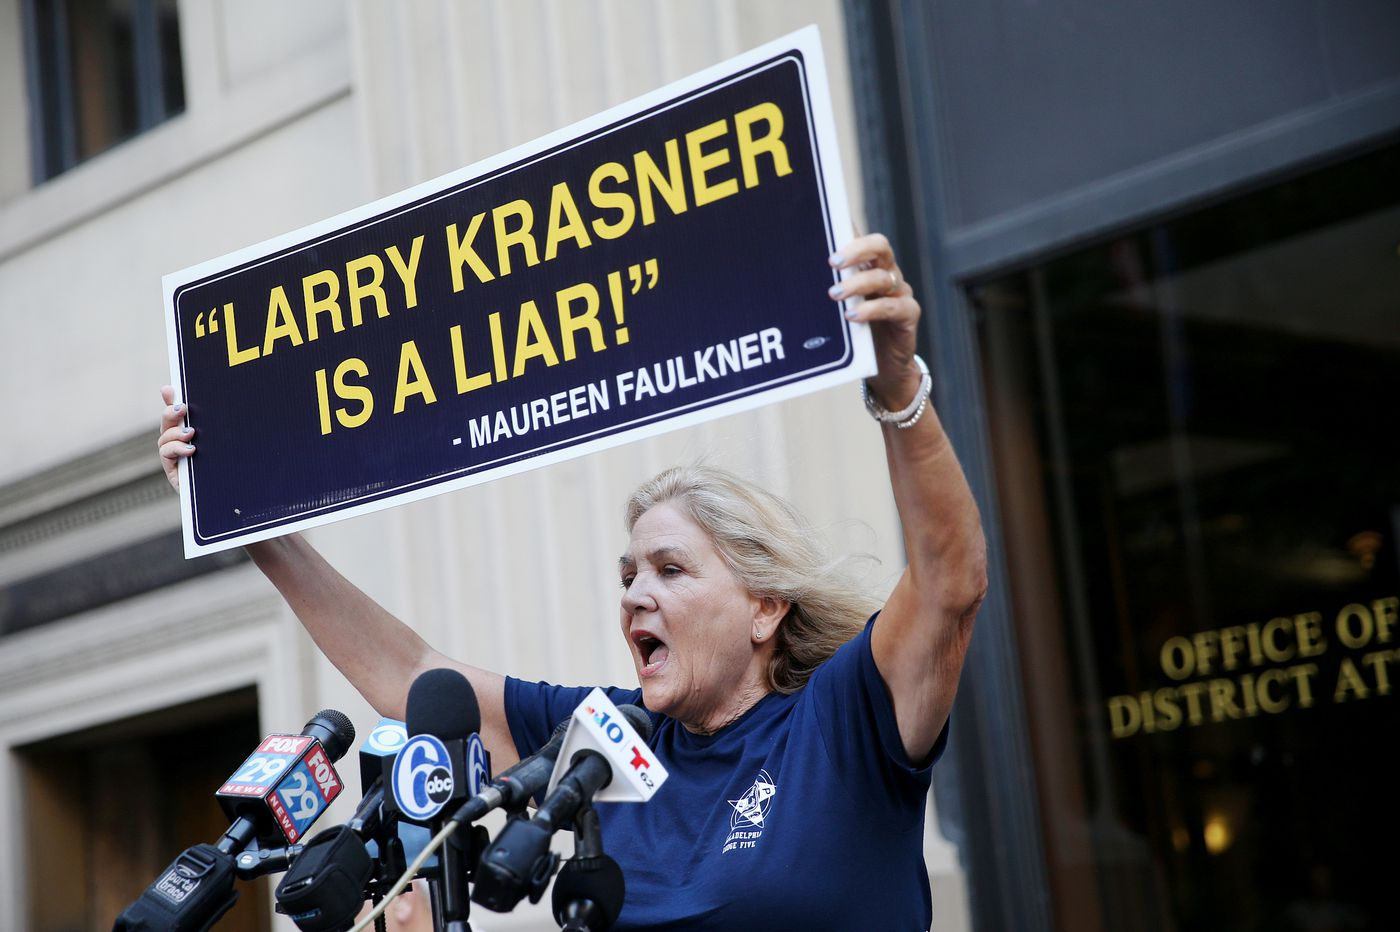 Maureen Faulkner leads protest against Philly DA Krasner over Mumia Abu-Jamal appeals